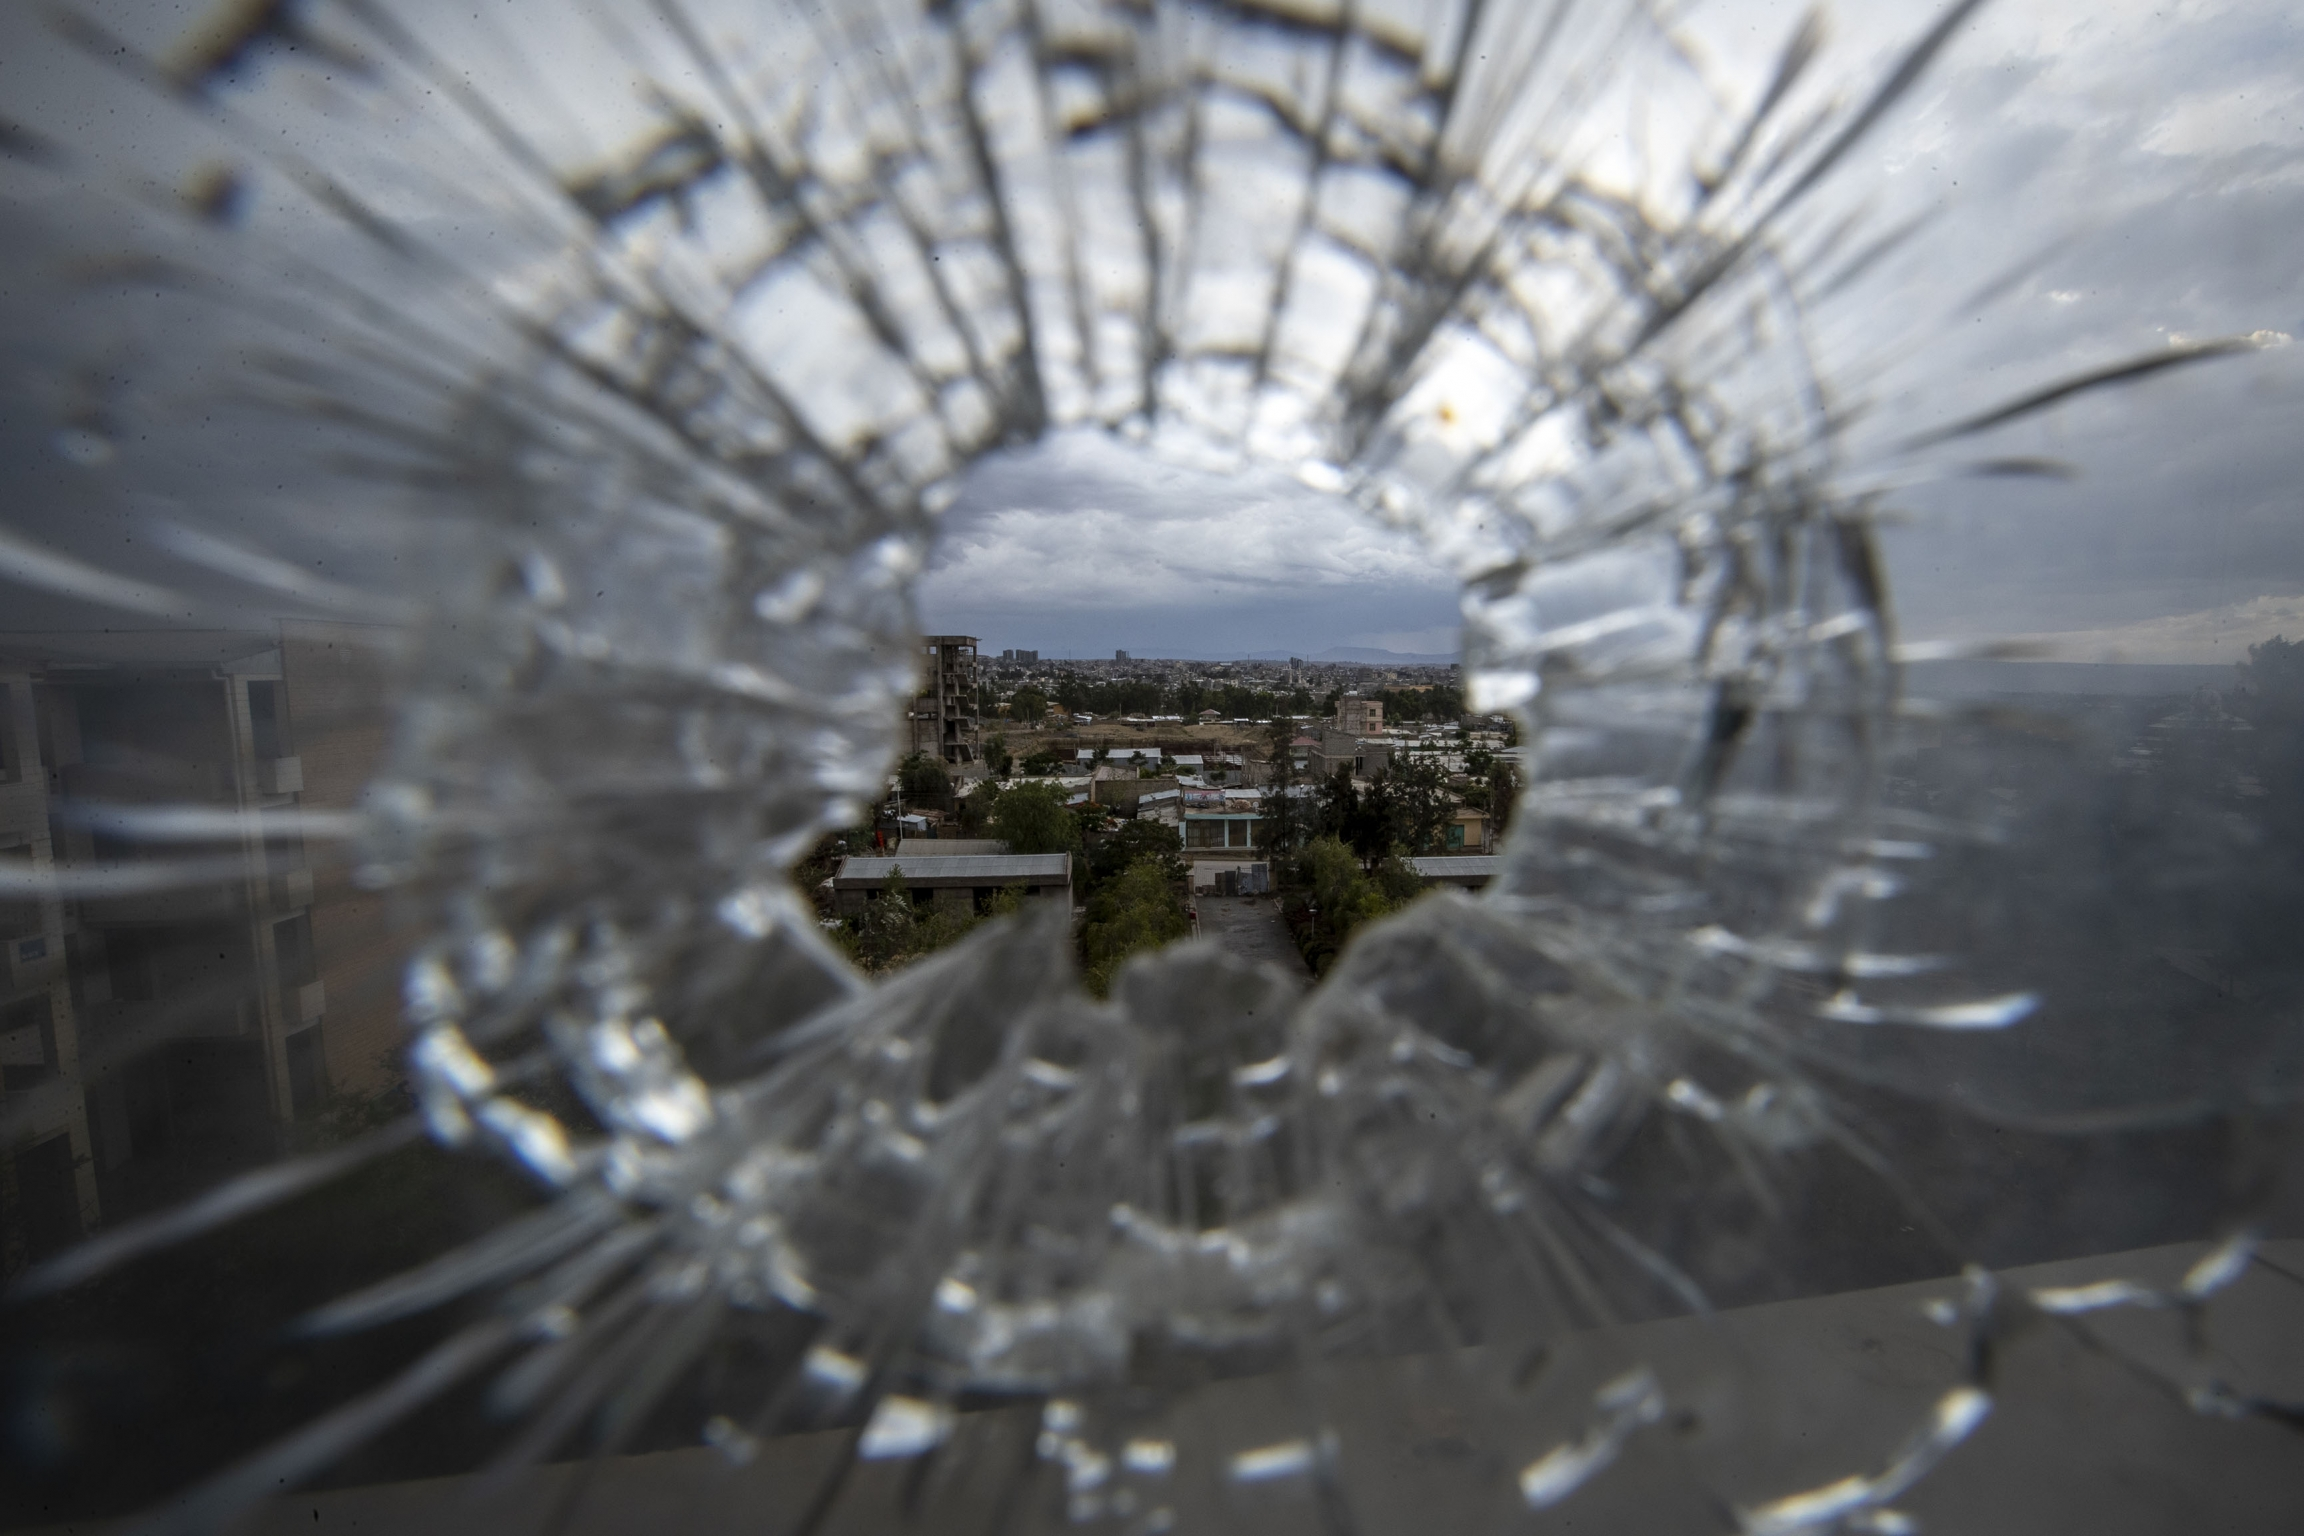 Glass shattered from bullet.